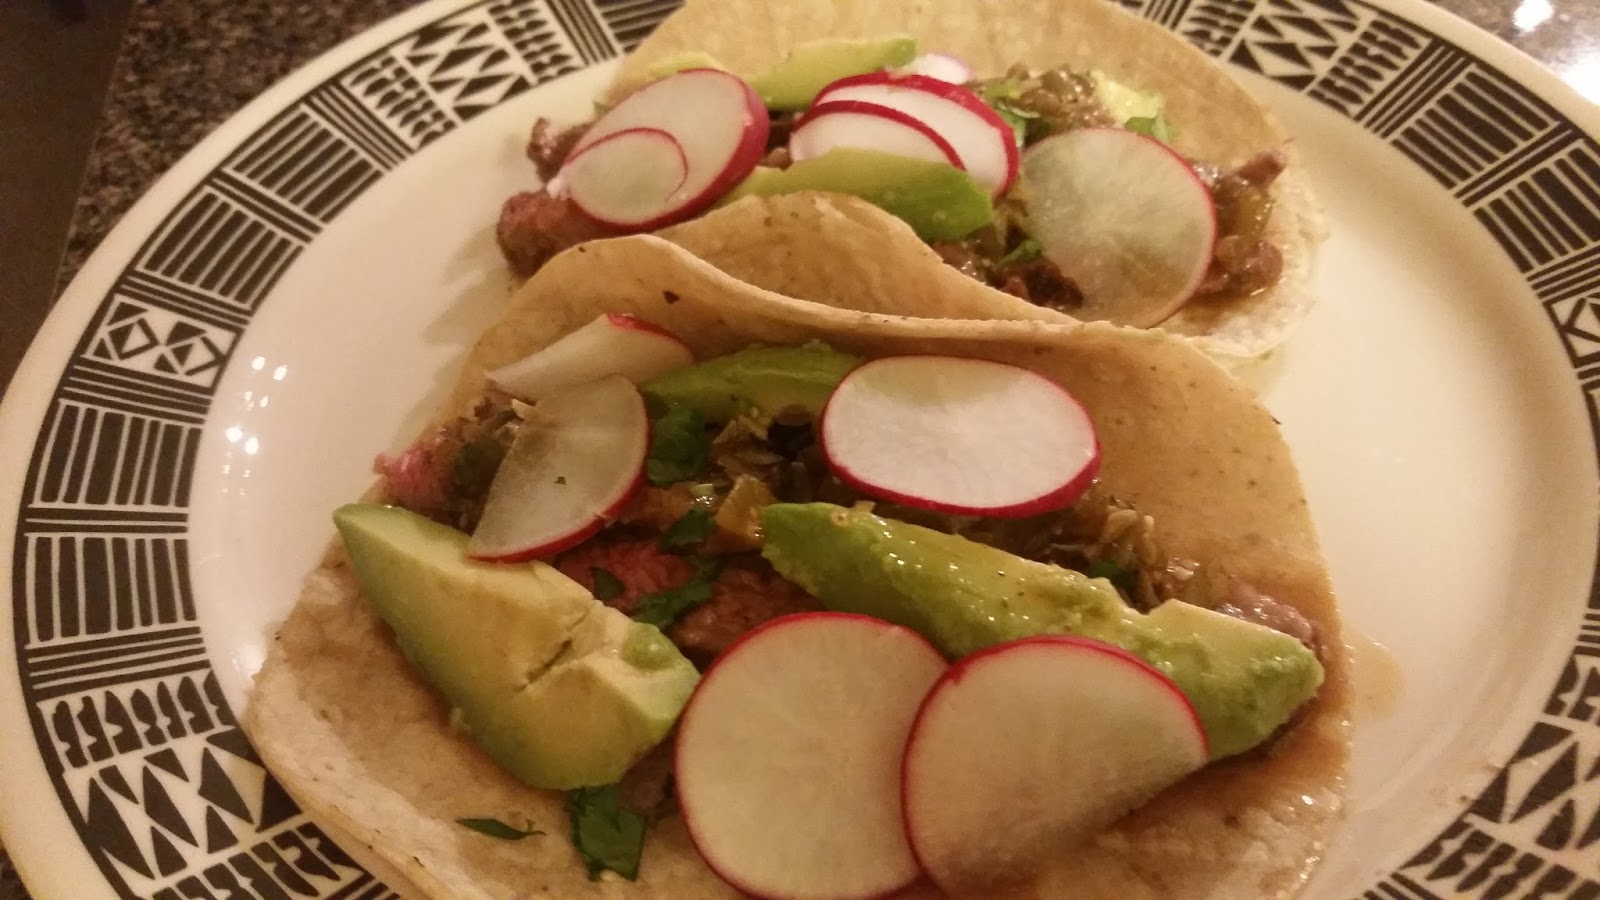 Blue apron tacos - Blue Apron Tacos 49